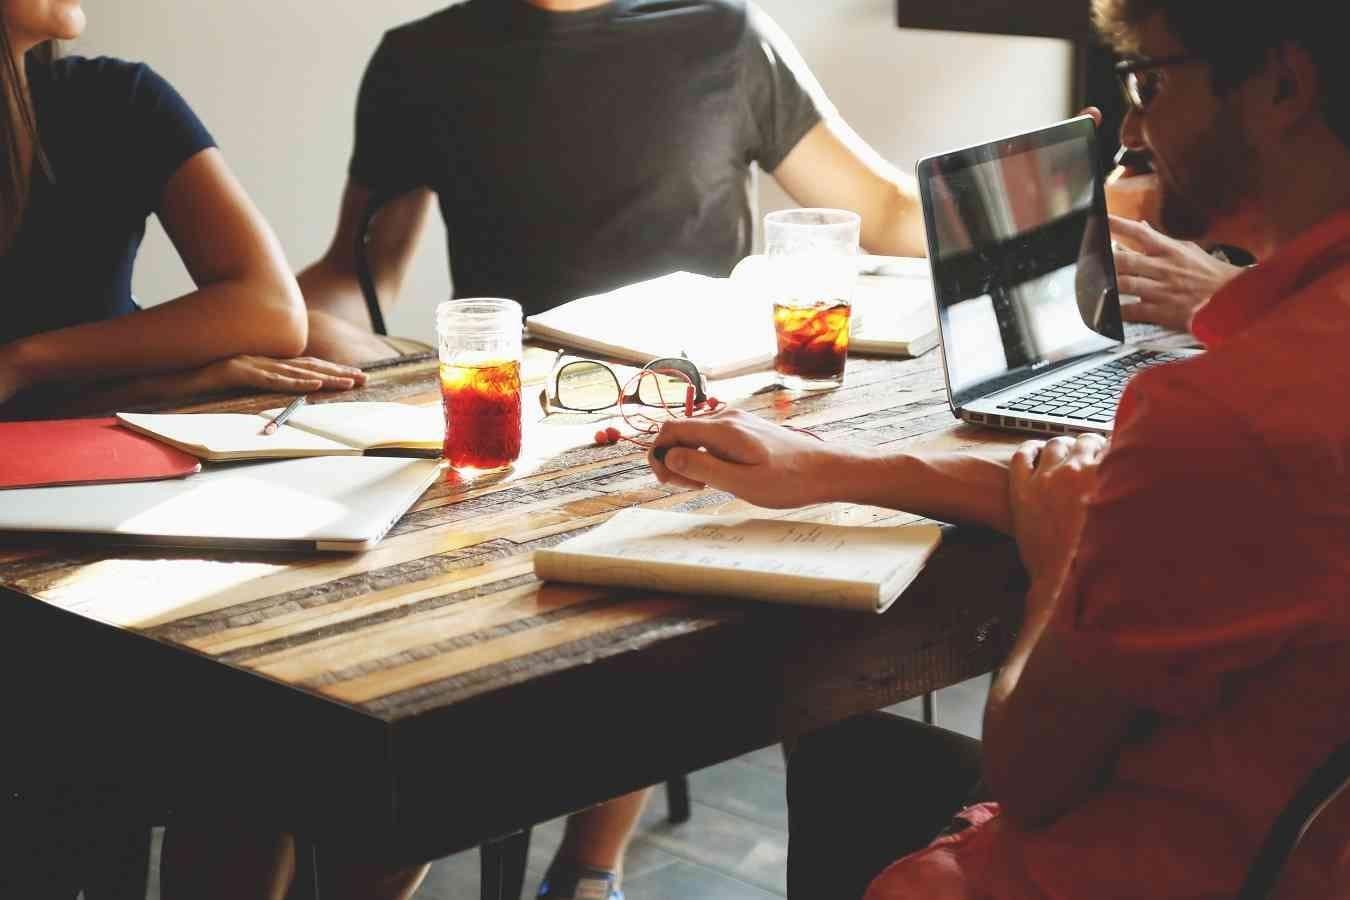 delegate your work